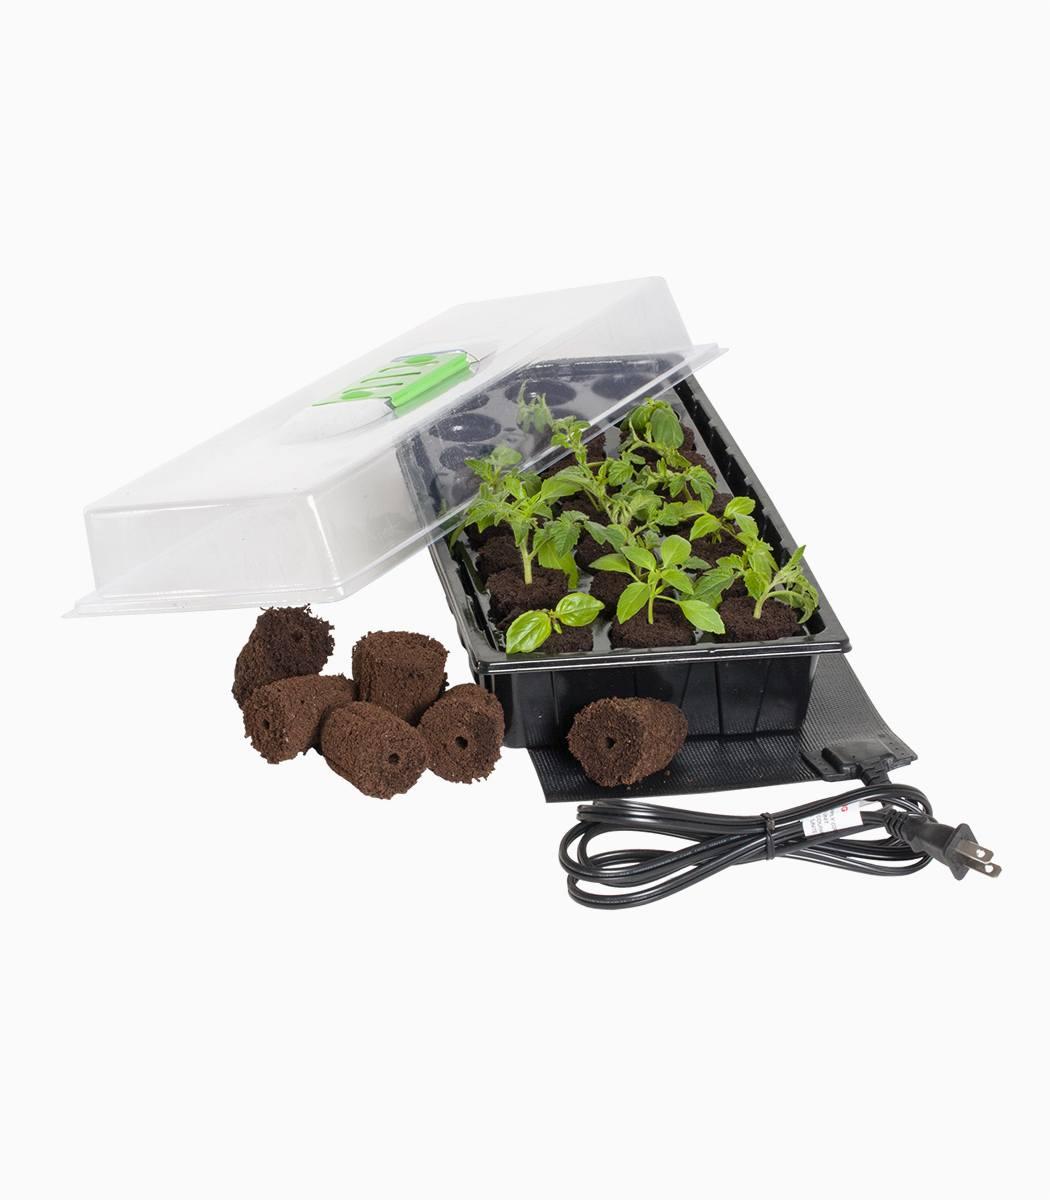 Jump Start 24-Cell Grow Plug Mini Germination Station with Heat Mat